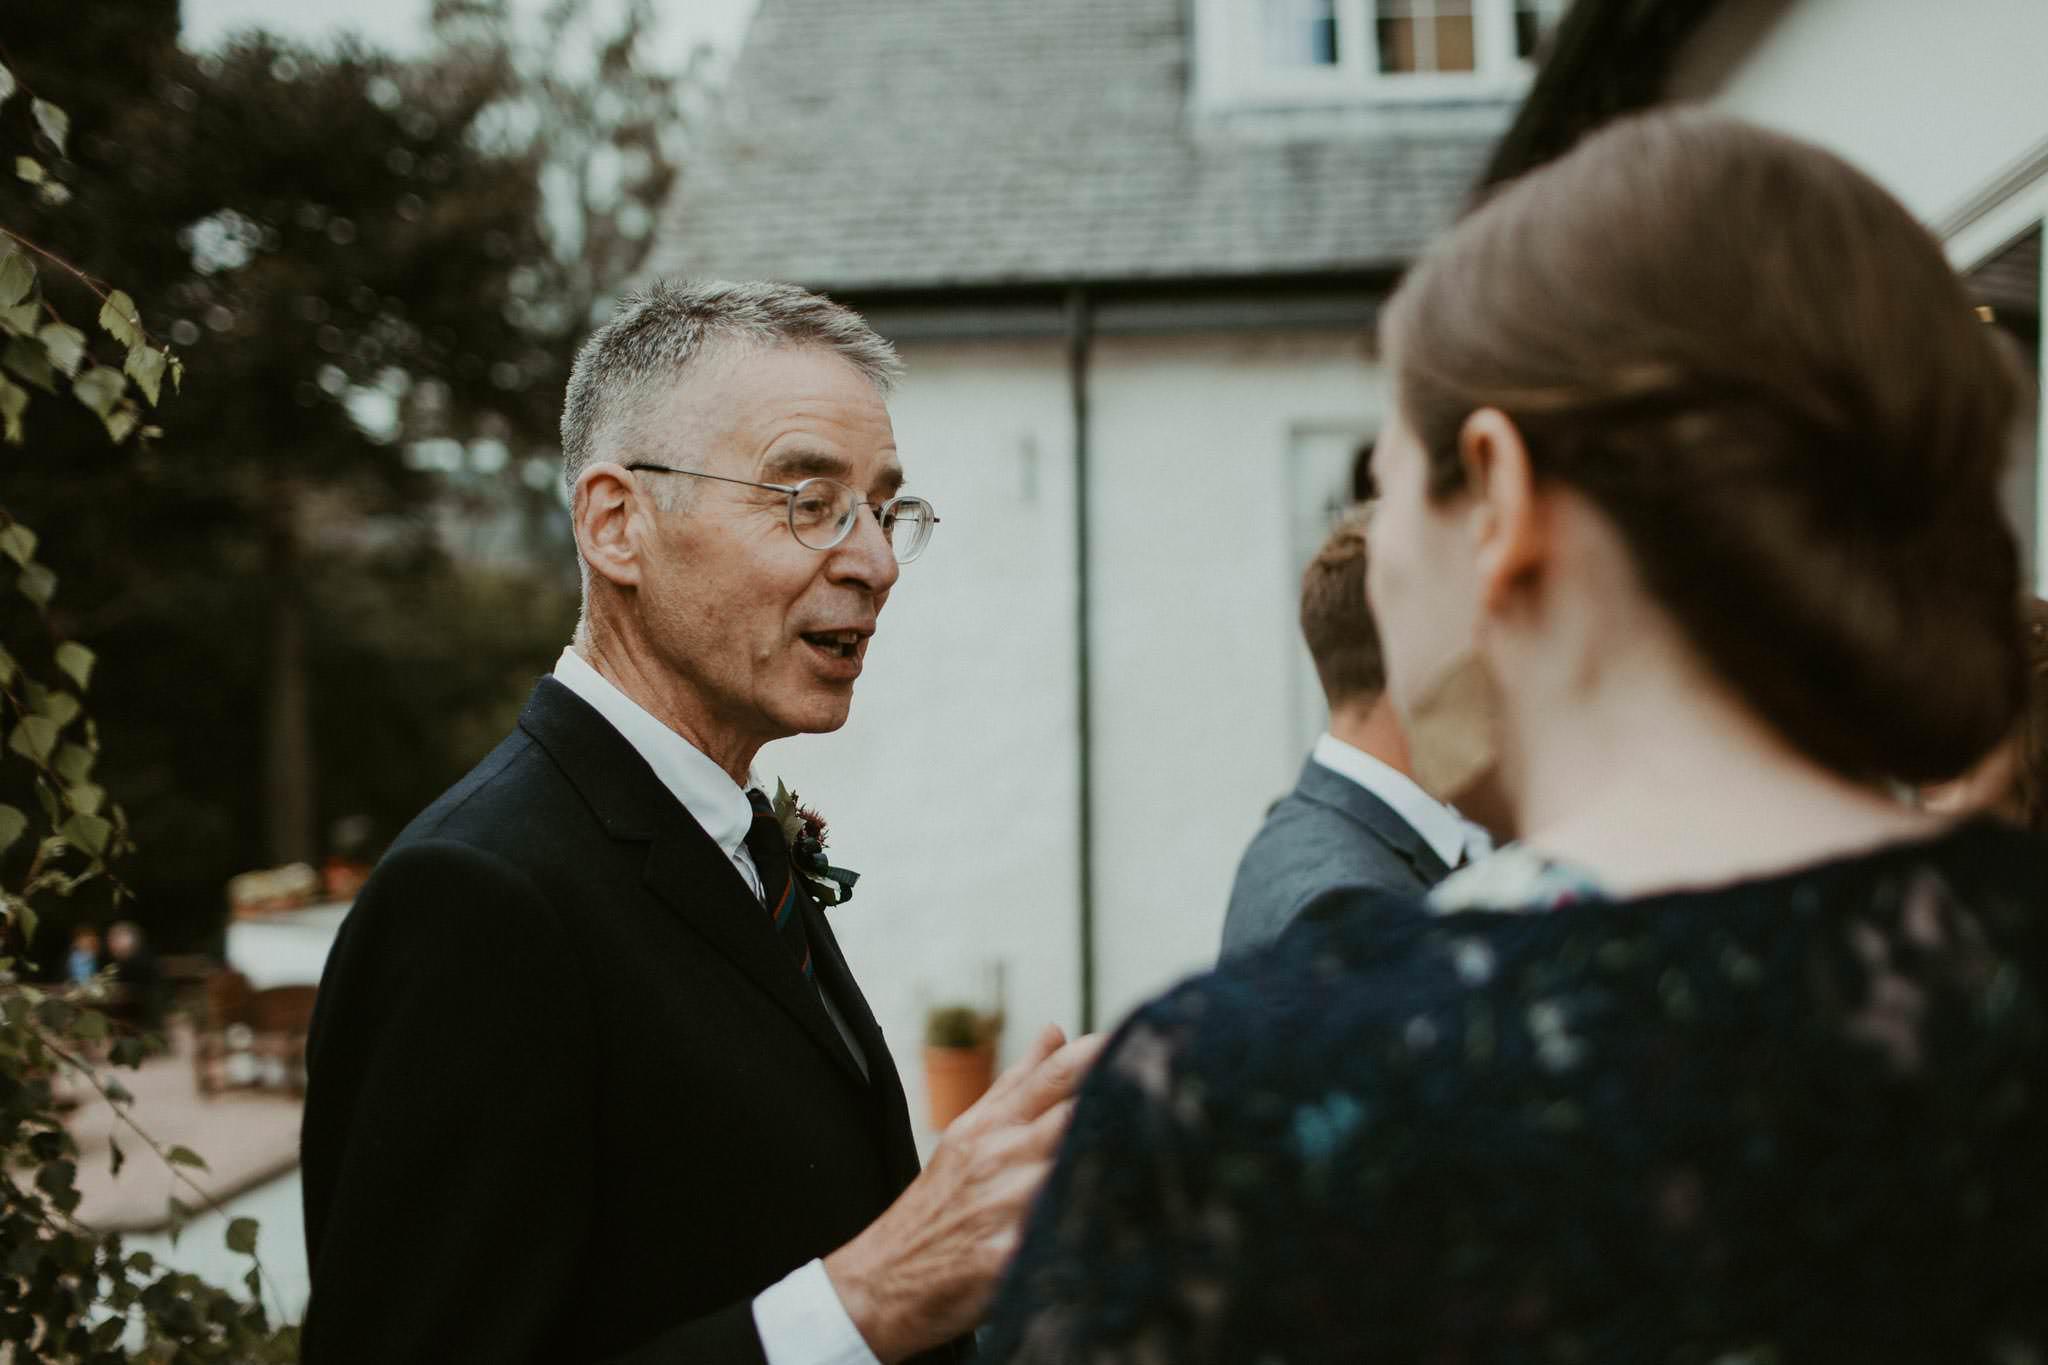 scotland-wedding-photographer-154